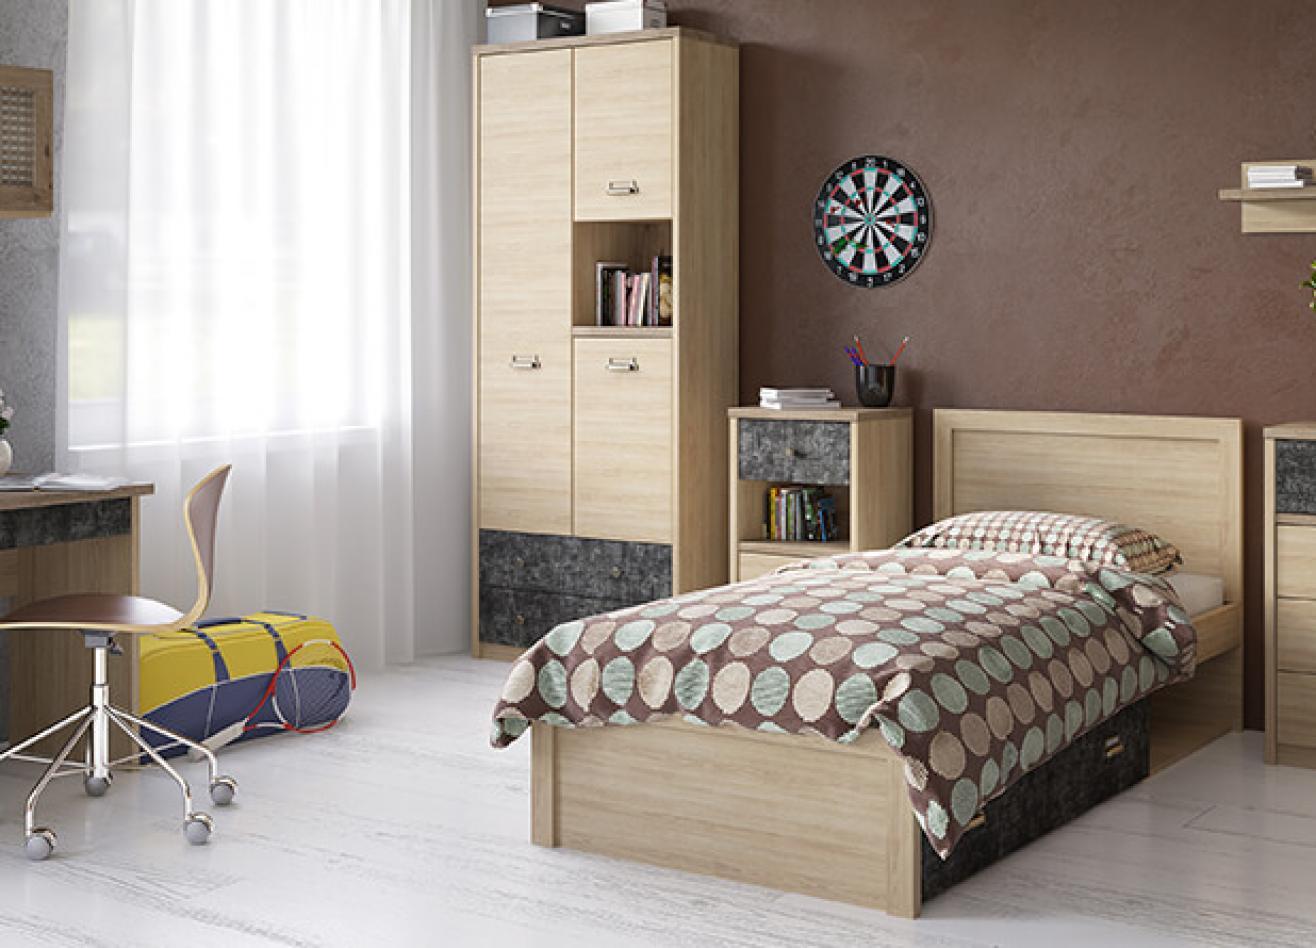 Коллекция детской мебели Diesel Дуб Истамбул